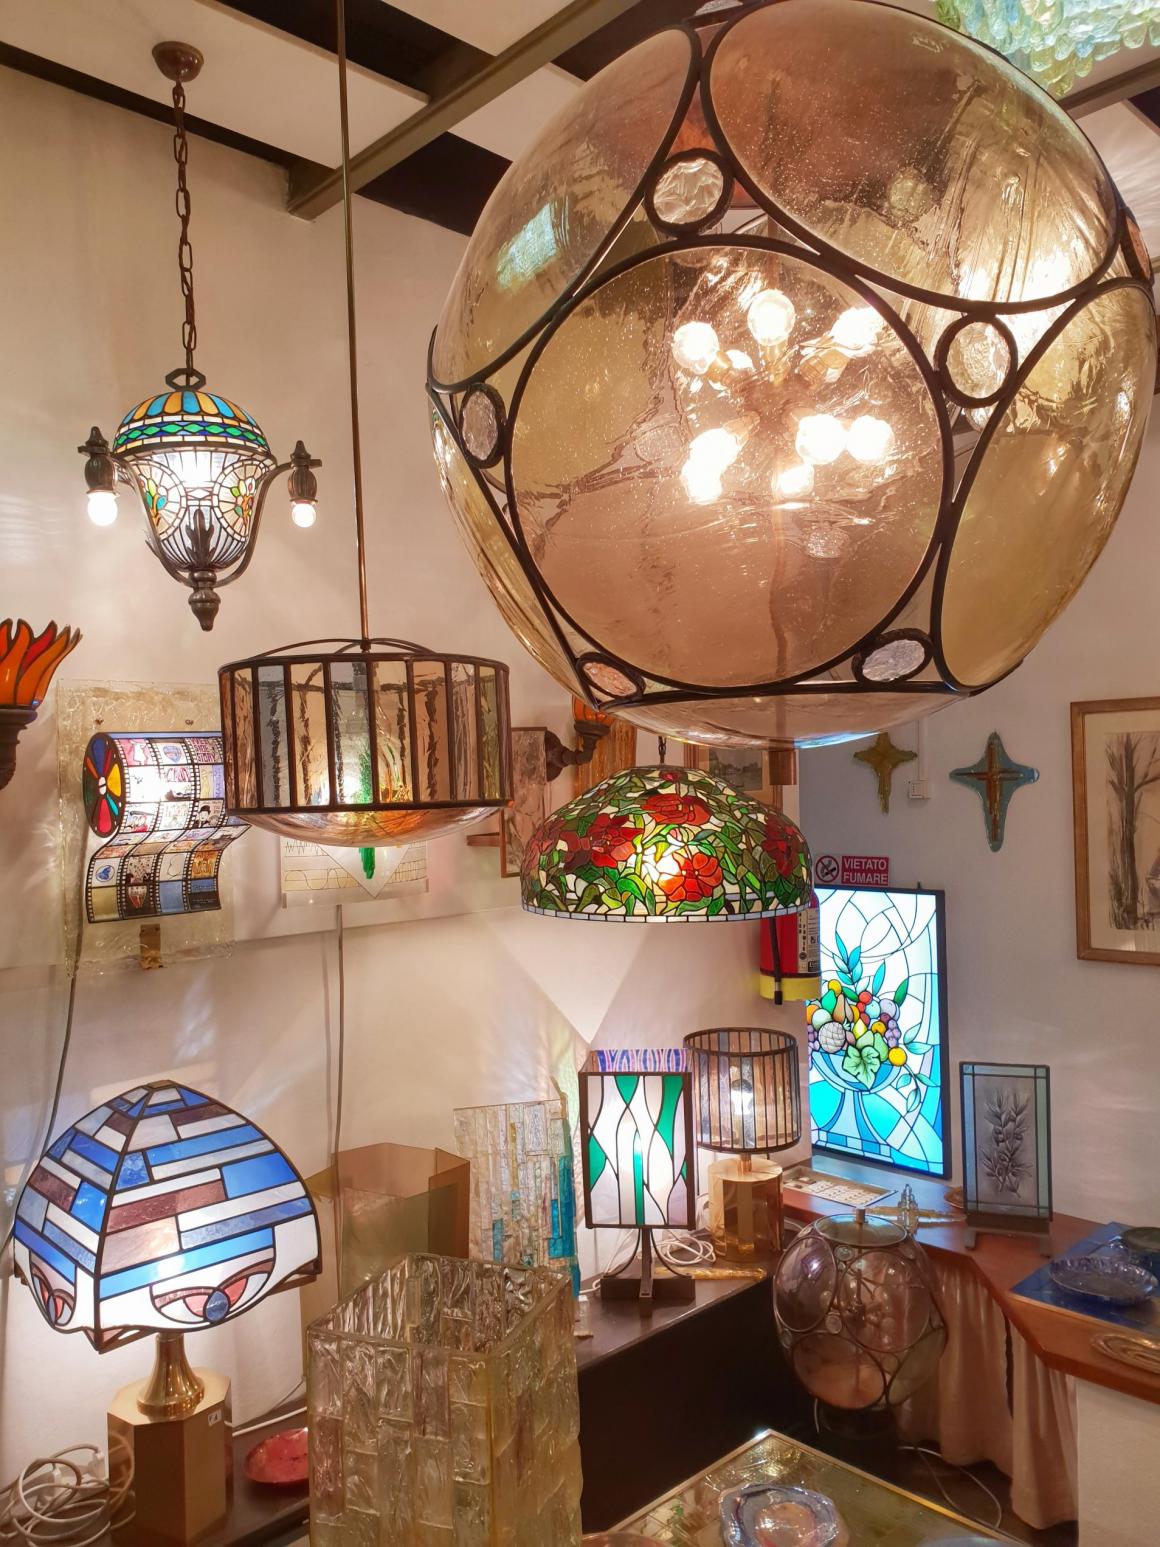 vidros-decorados